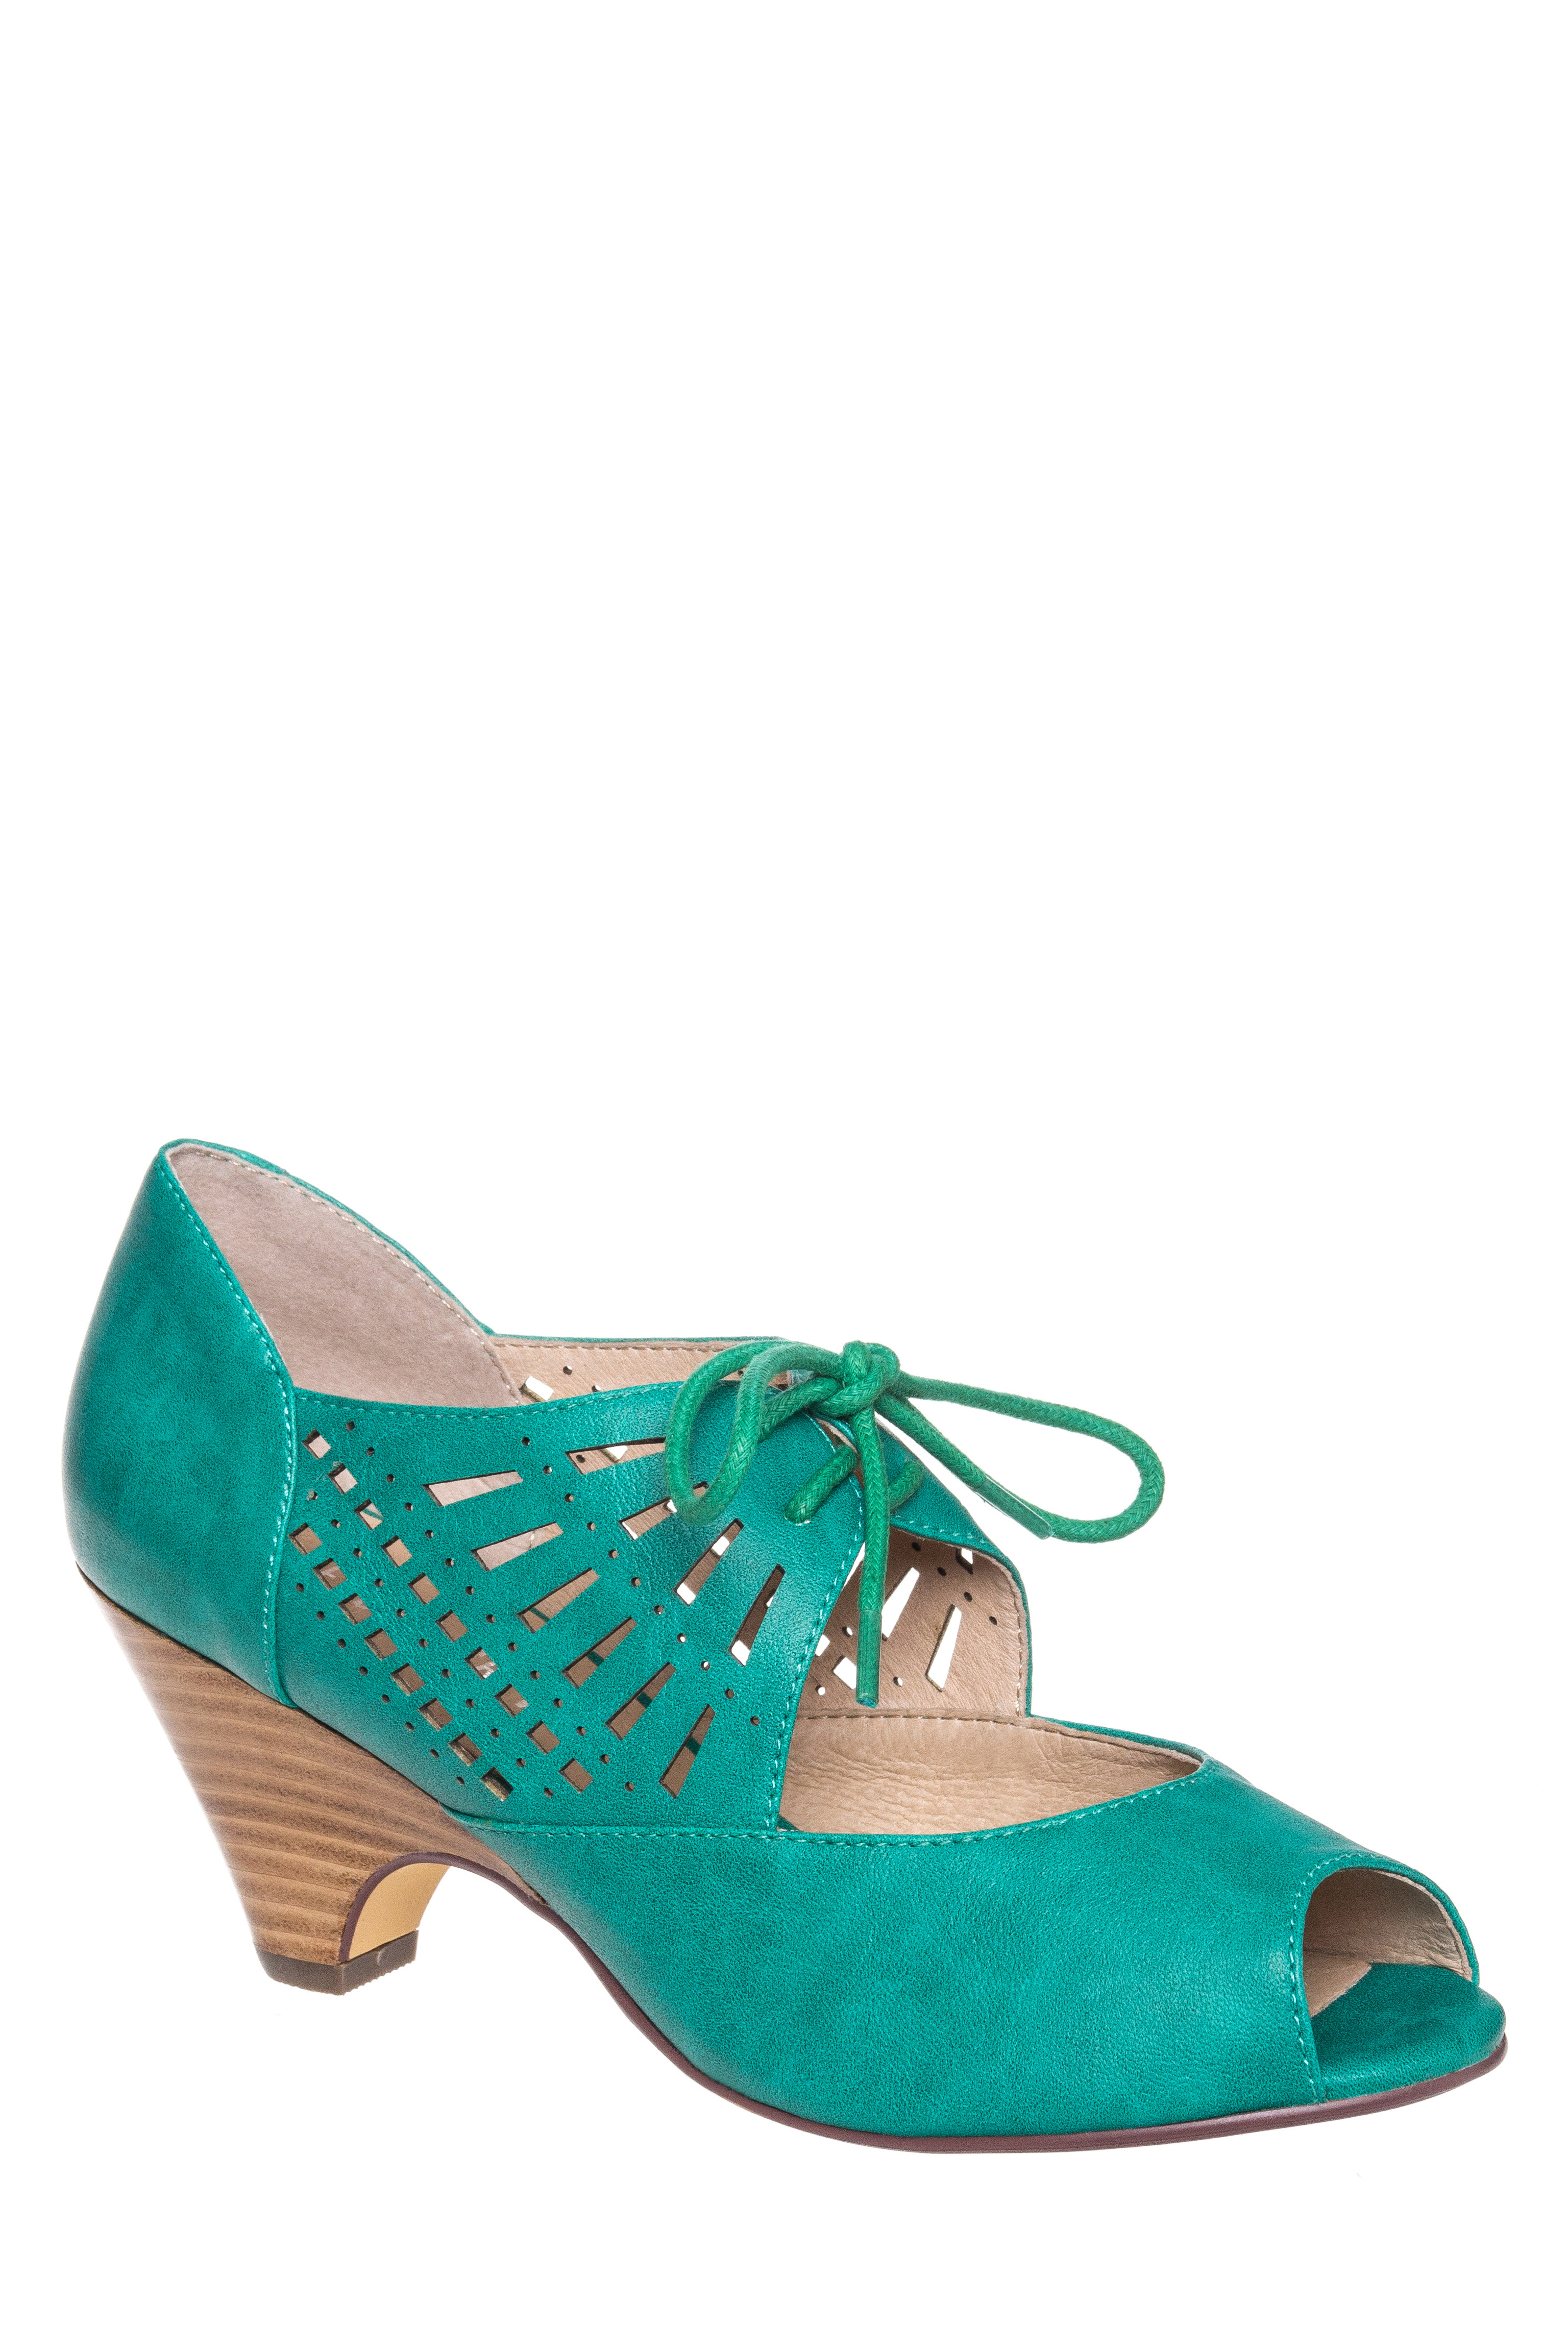 1960s Style Shoes Chelsea Crew Javits Low Heel Pump - Teal $69.99 AT vintagedancer.com